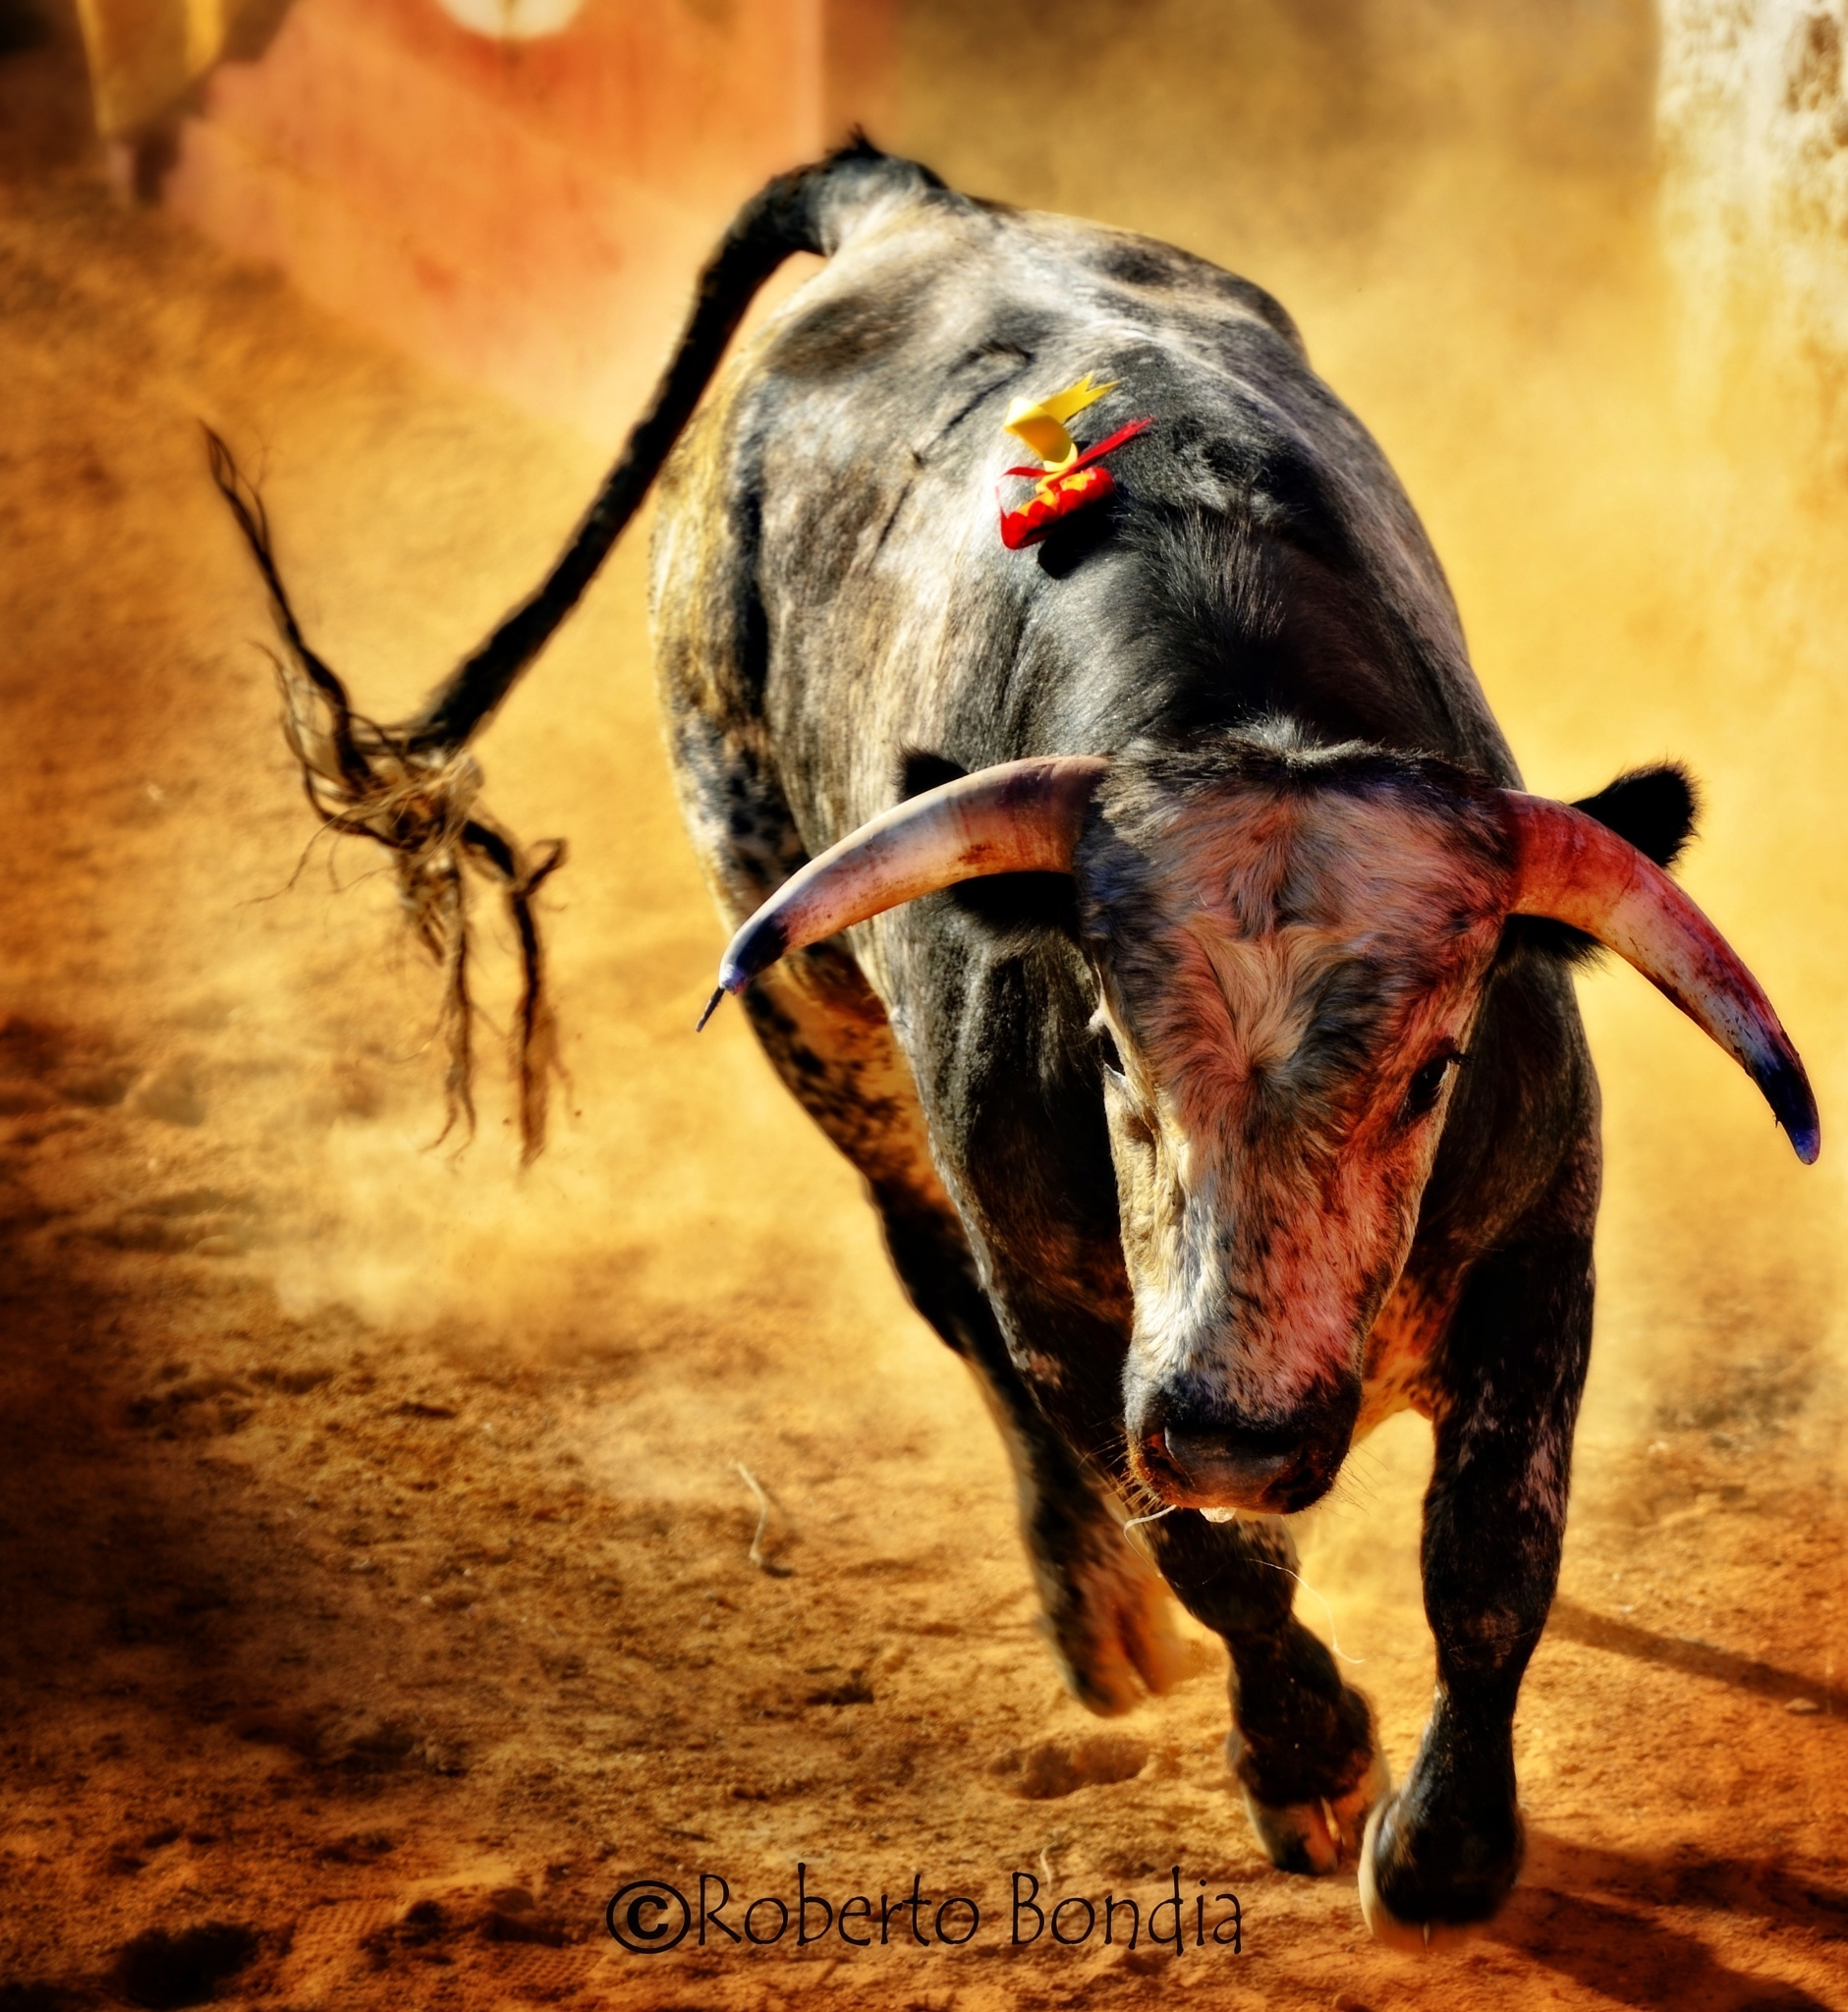 bull by Roberto Bondia